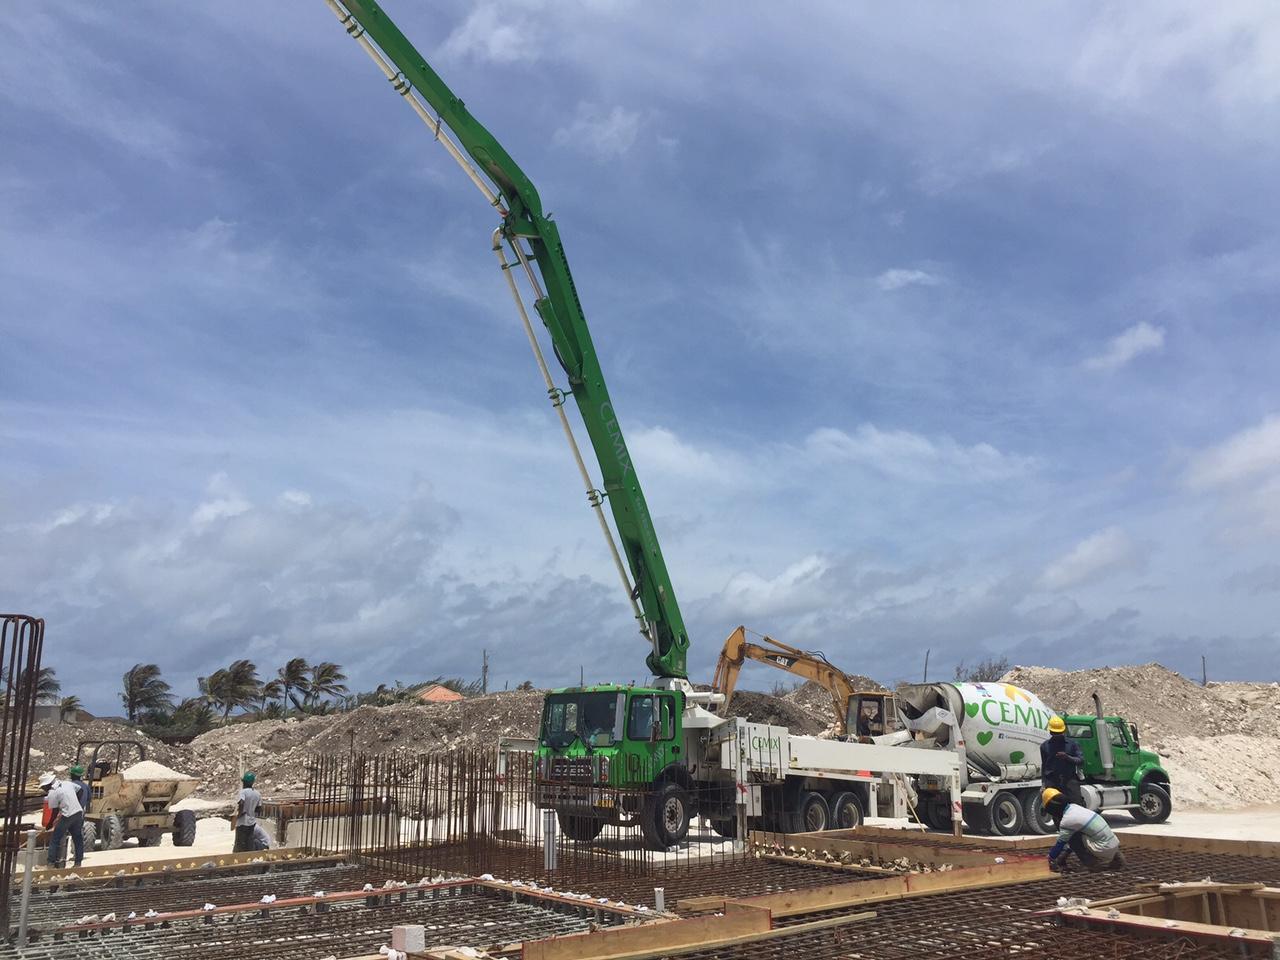 Boom pump pouring concrete to complete building foundation